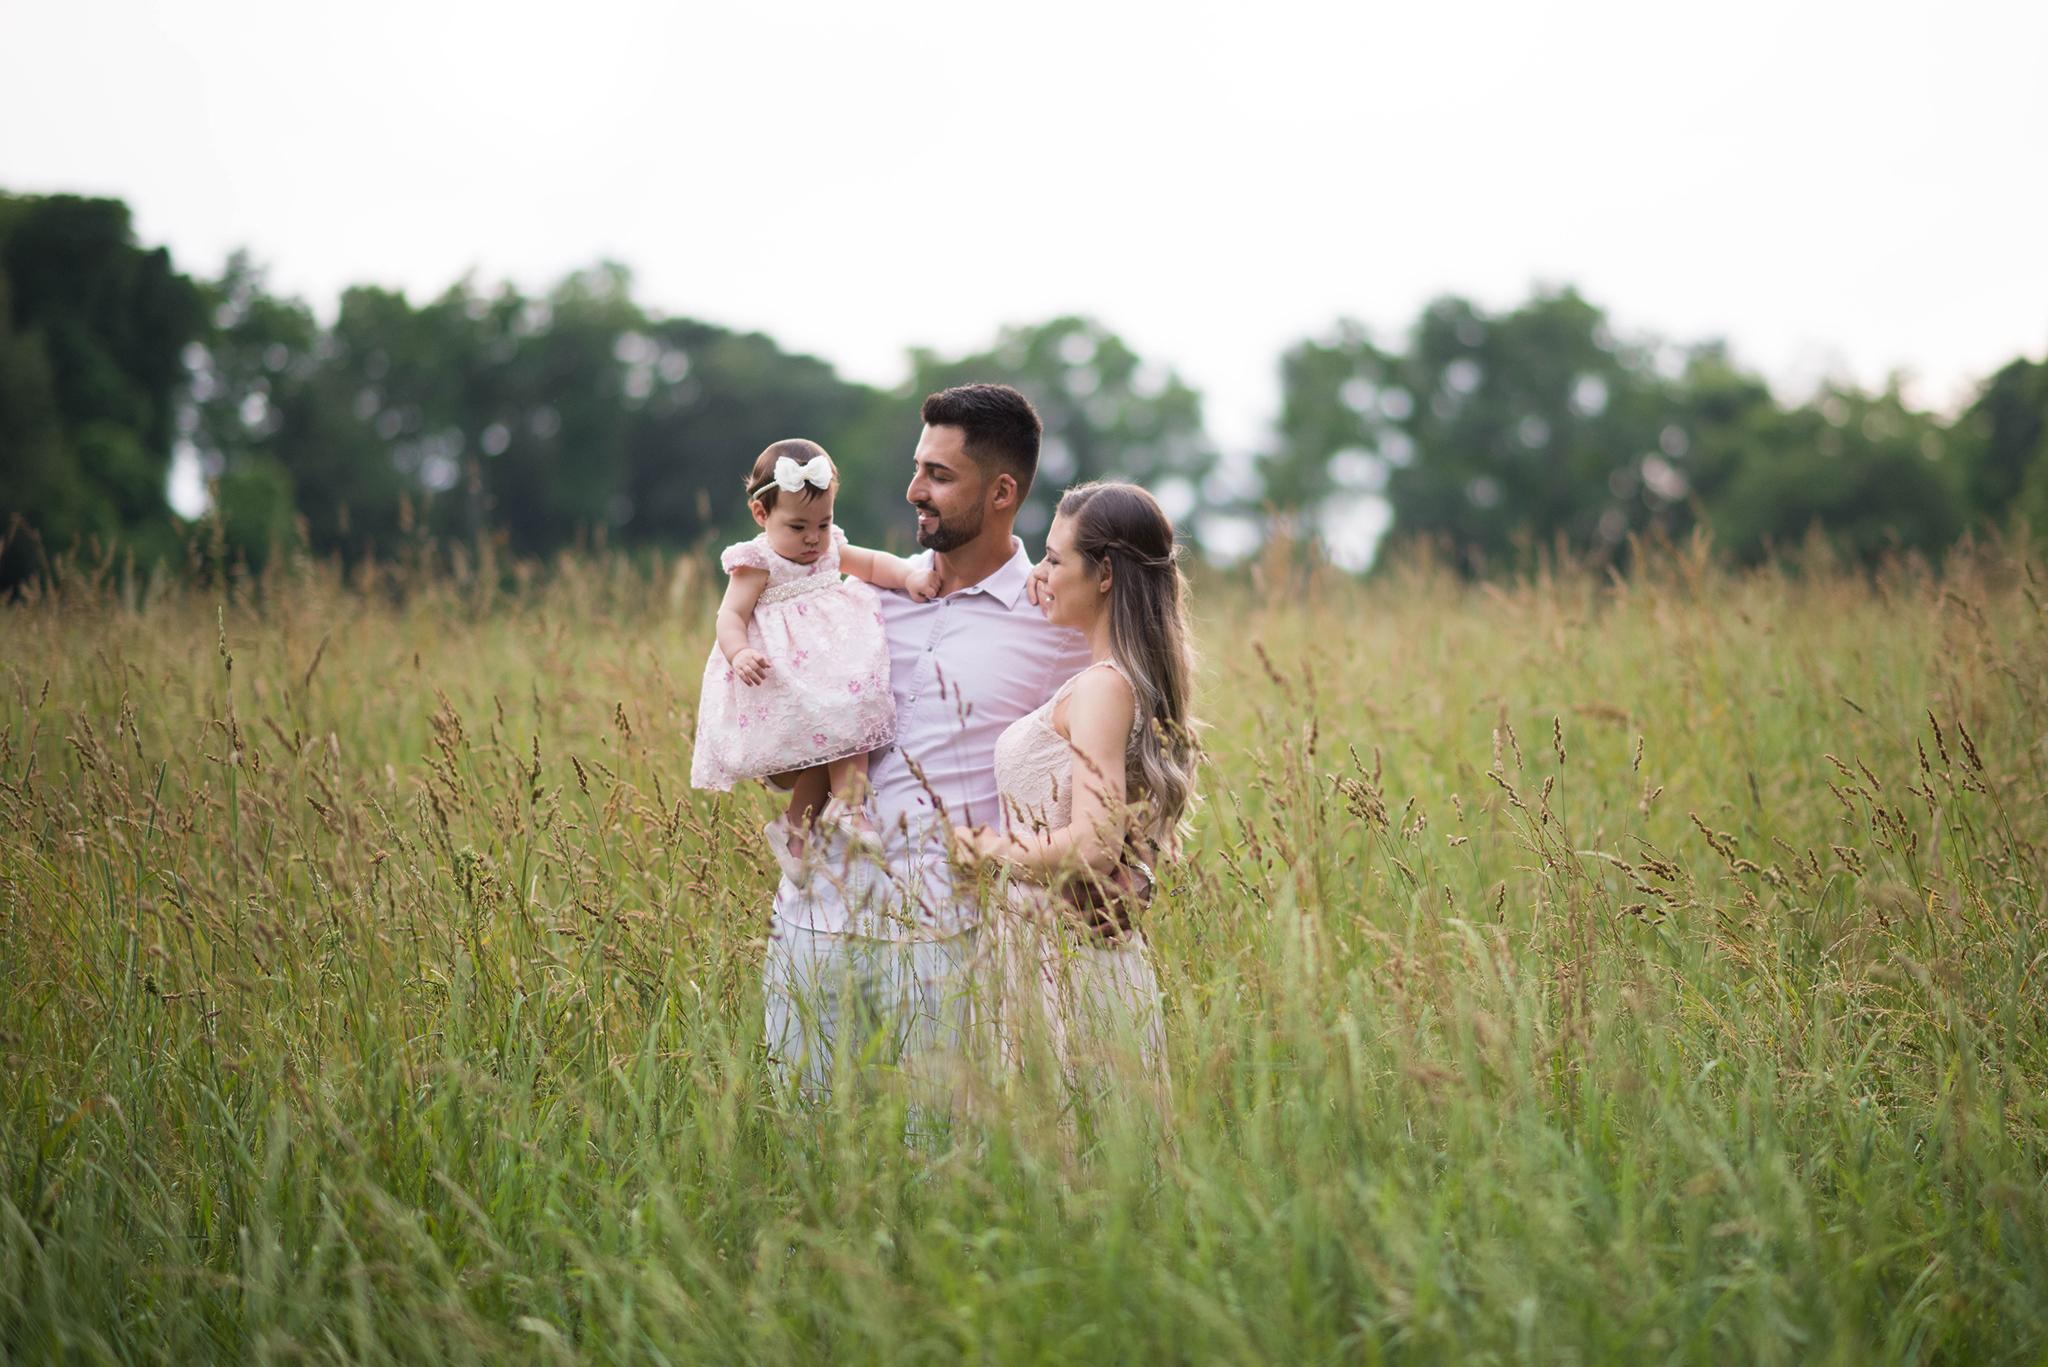 NJ-Newborn-family-Photographer-26.JPG